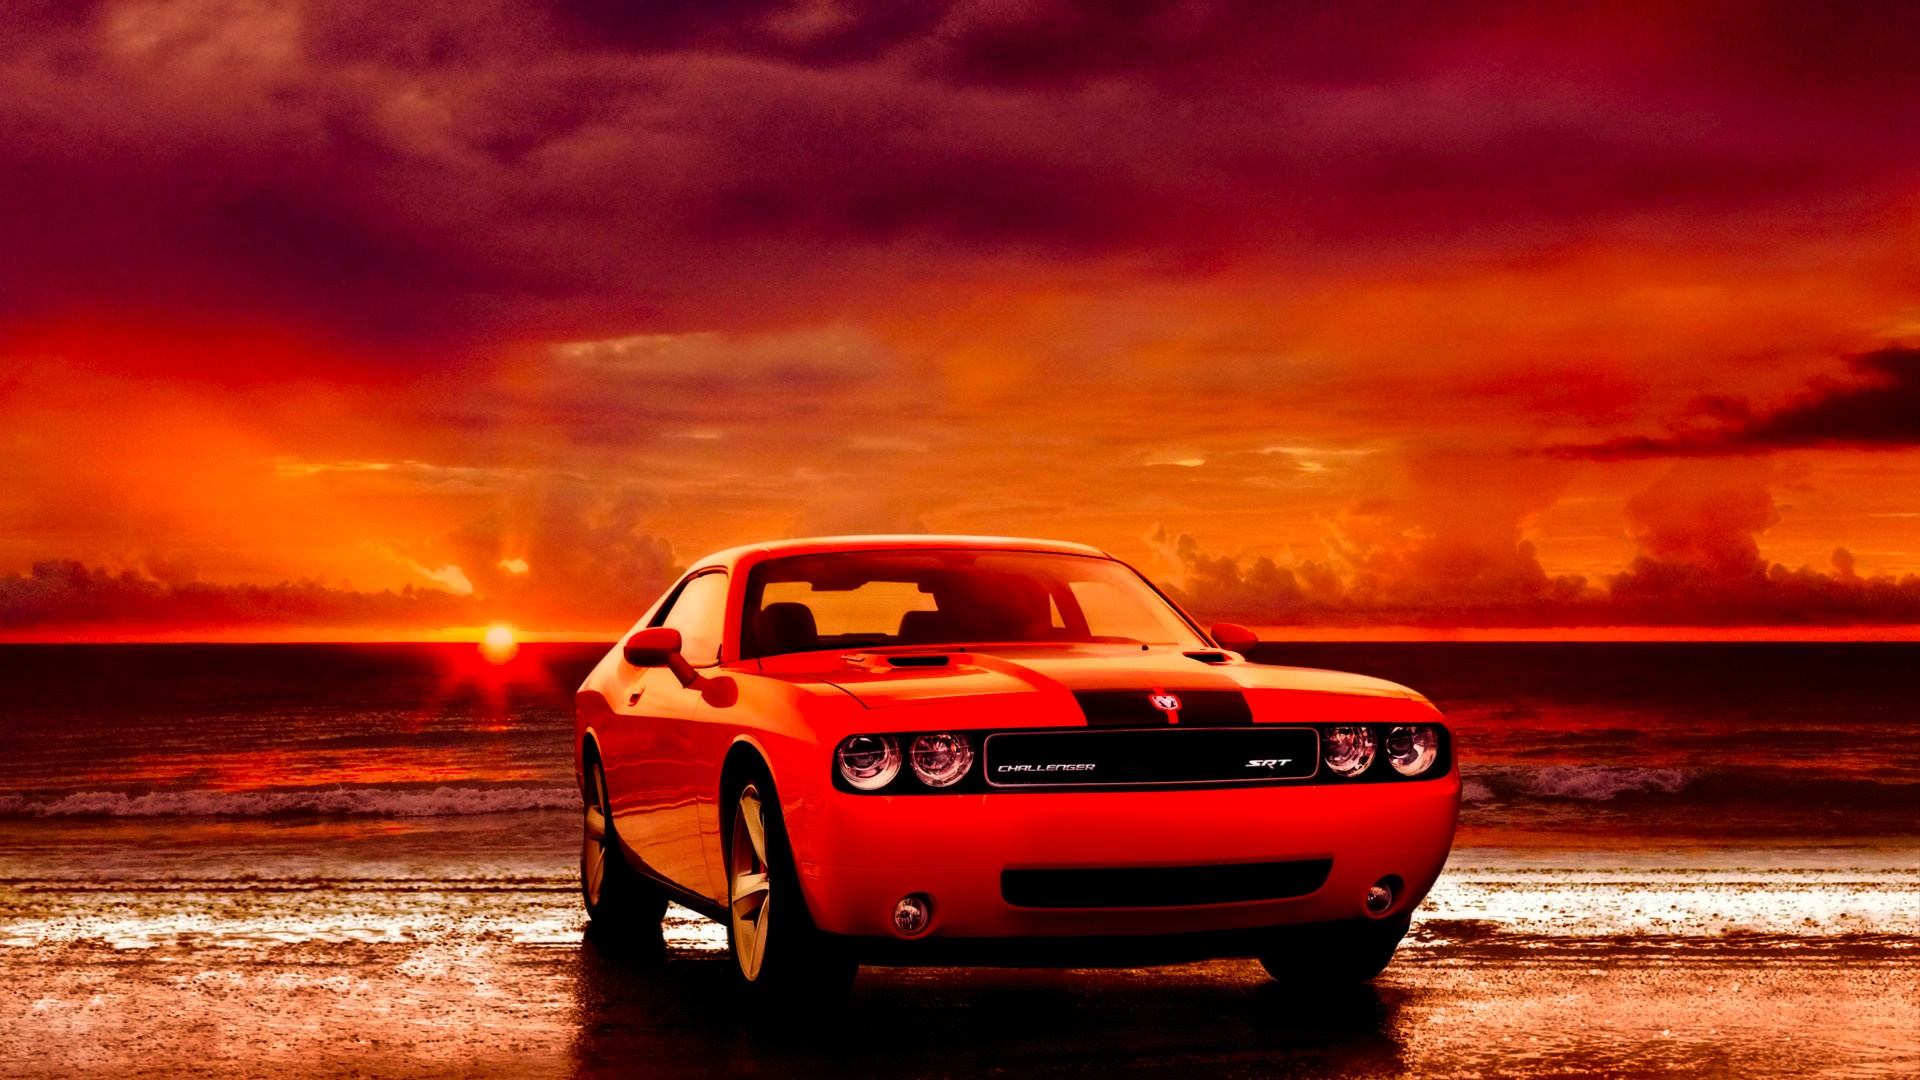 Dodge Challenger SRT HD Wallpaper - backiee - Free Ultra ...